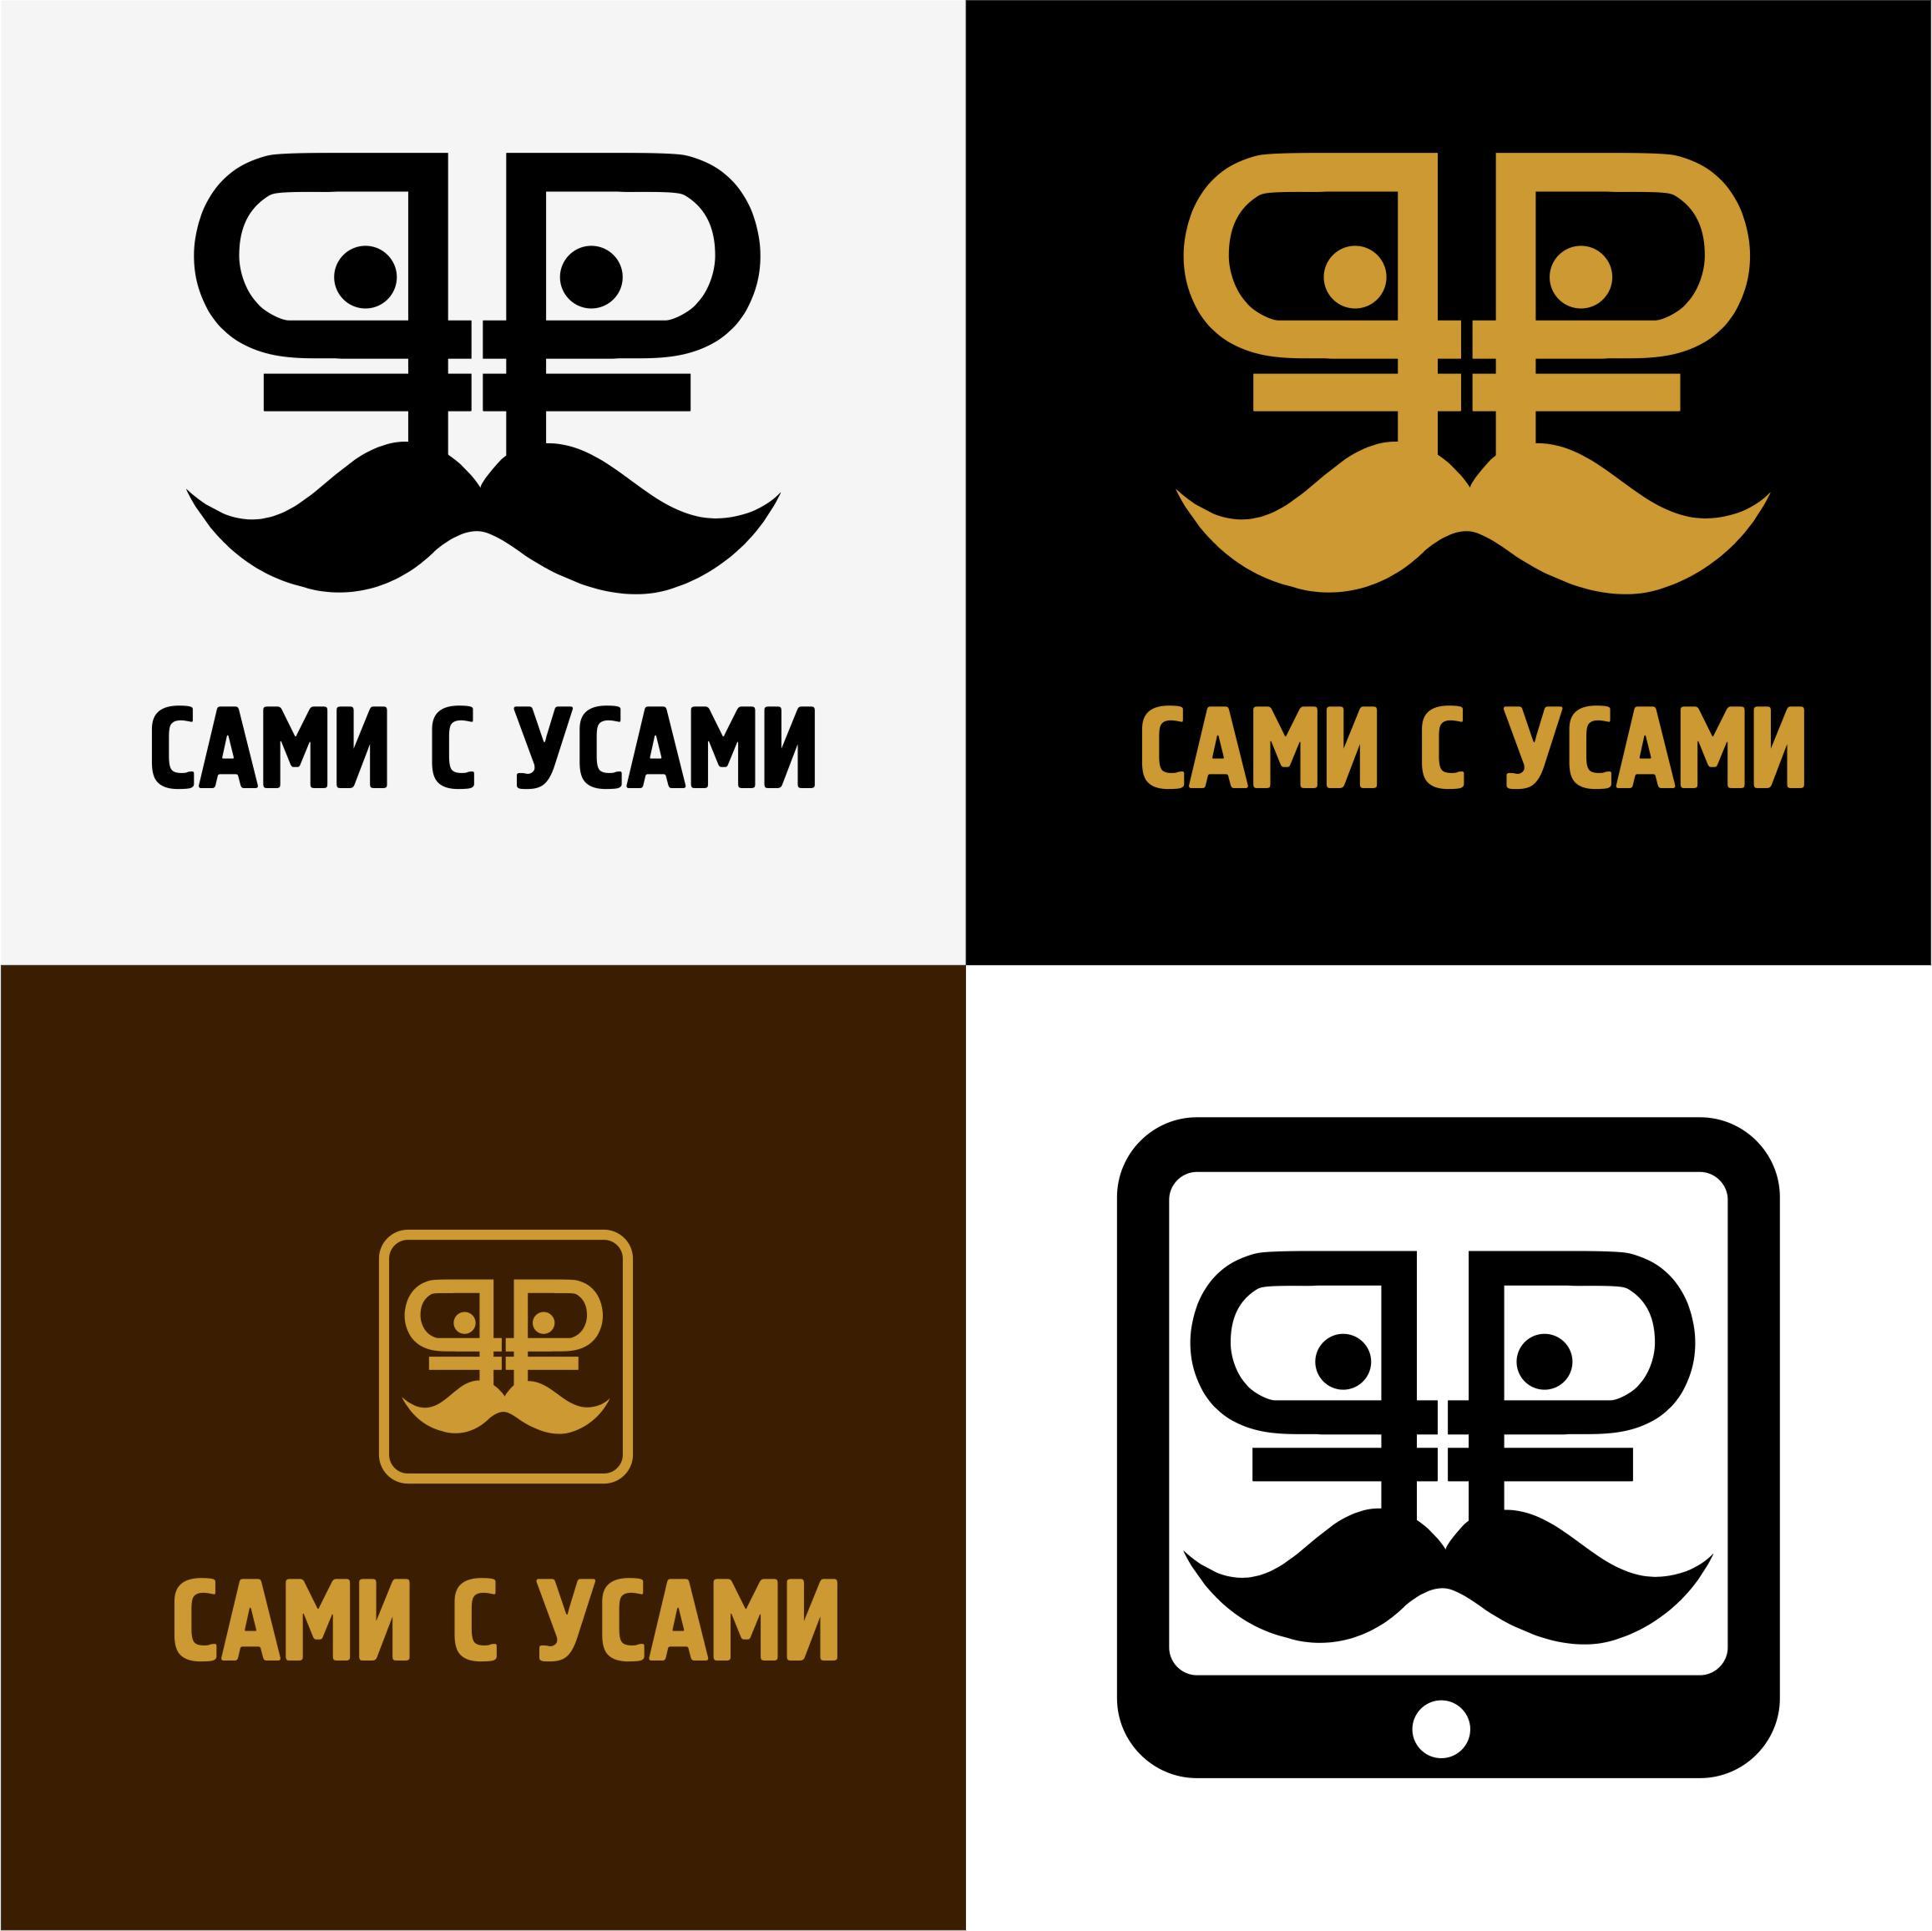 Разработка Логотипа 6 000 руб. фото f_80958f77b0708d19.jpg